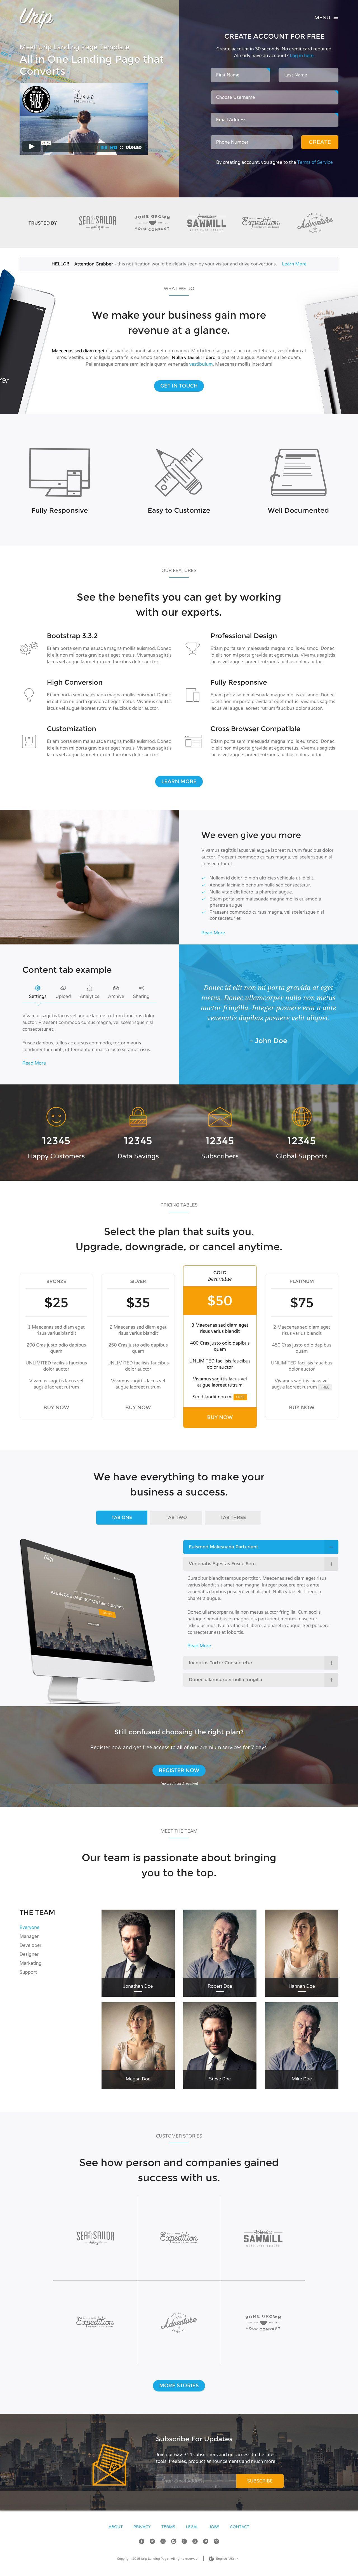 Urip - Professional WordPress Landing Page | Lead generation, Header ...